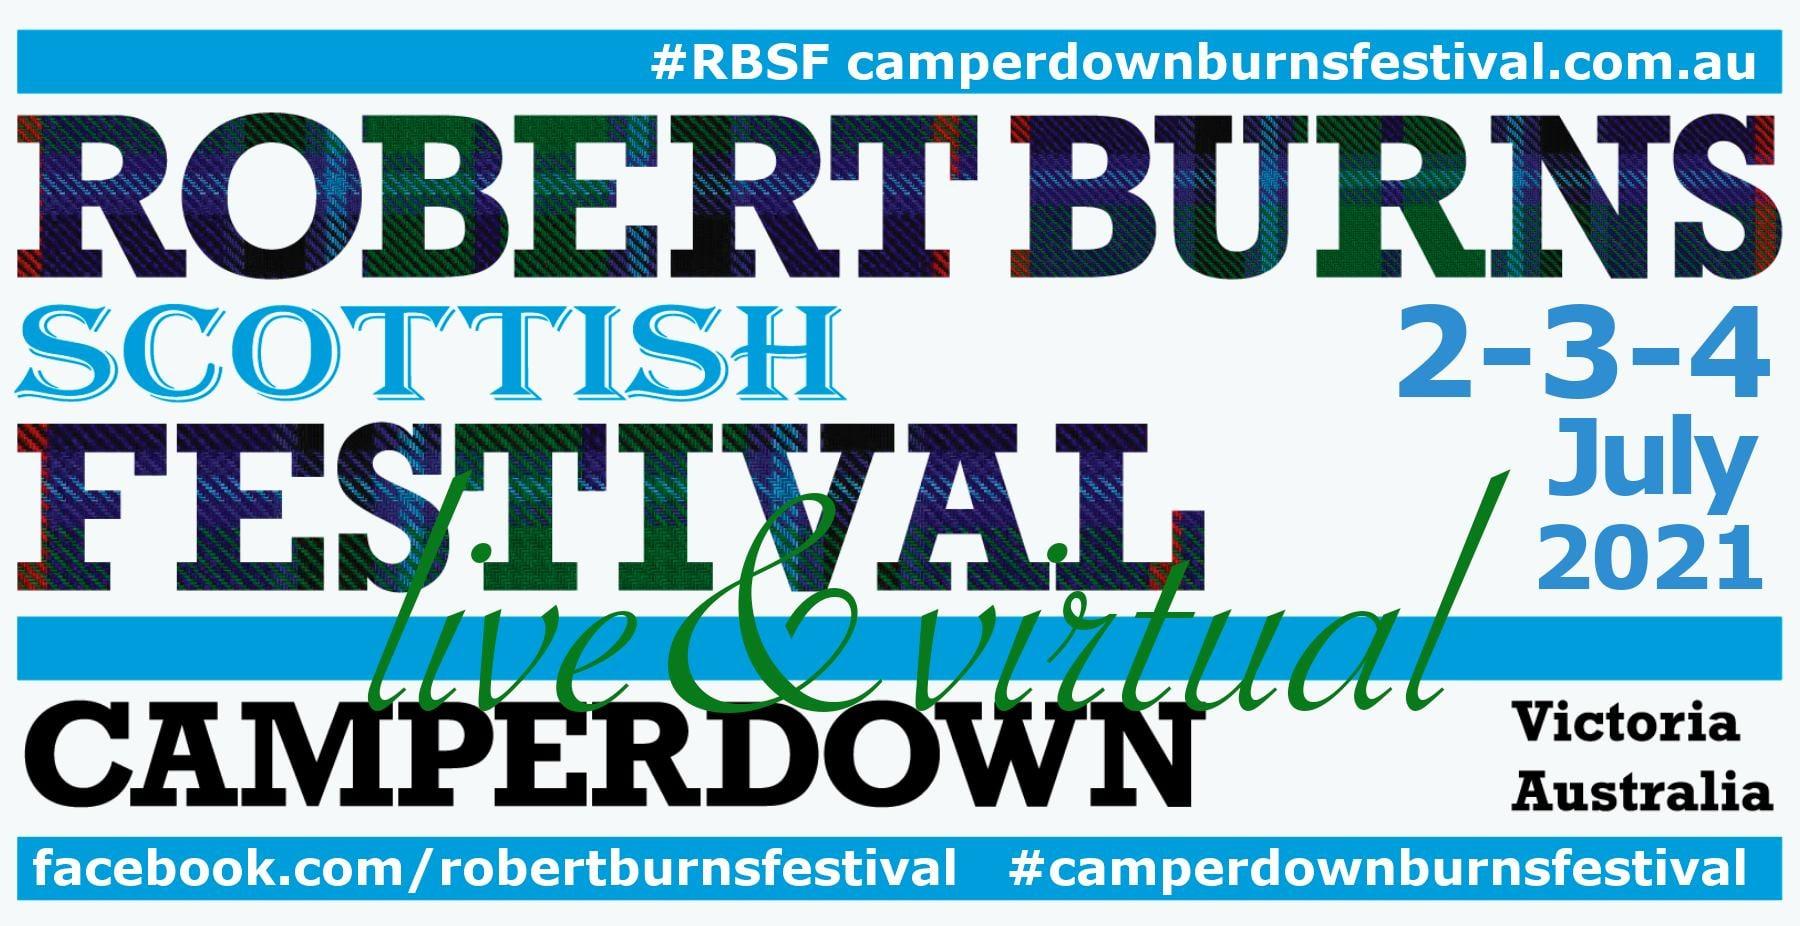 Camperdown Robert Burns Club